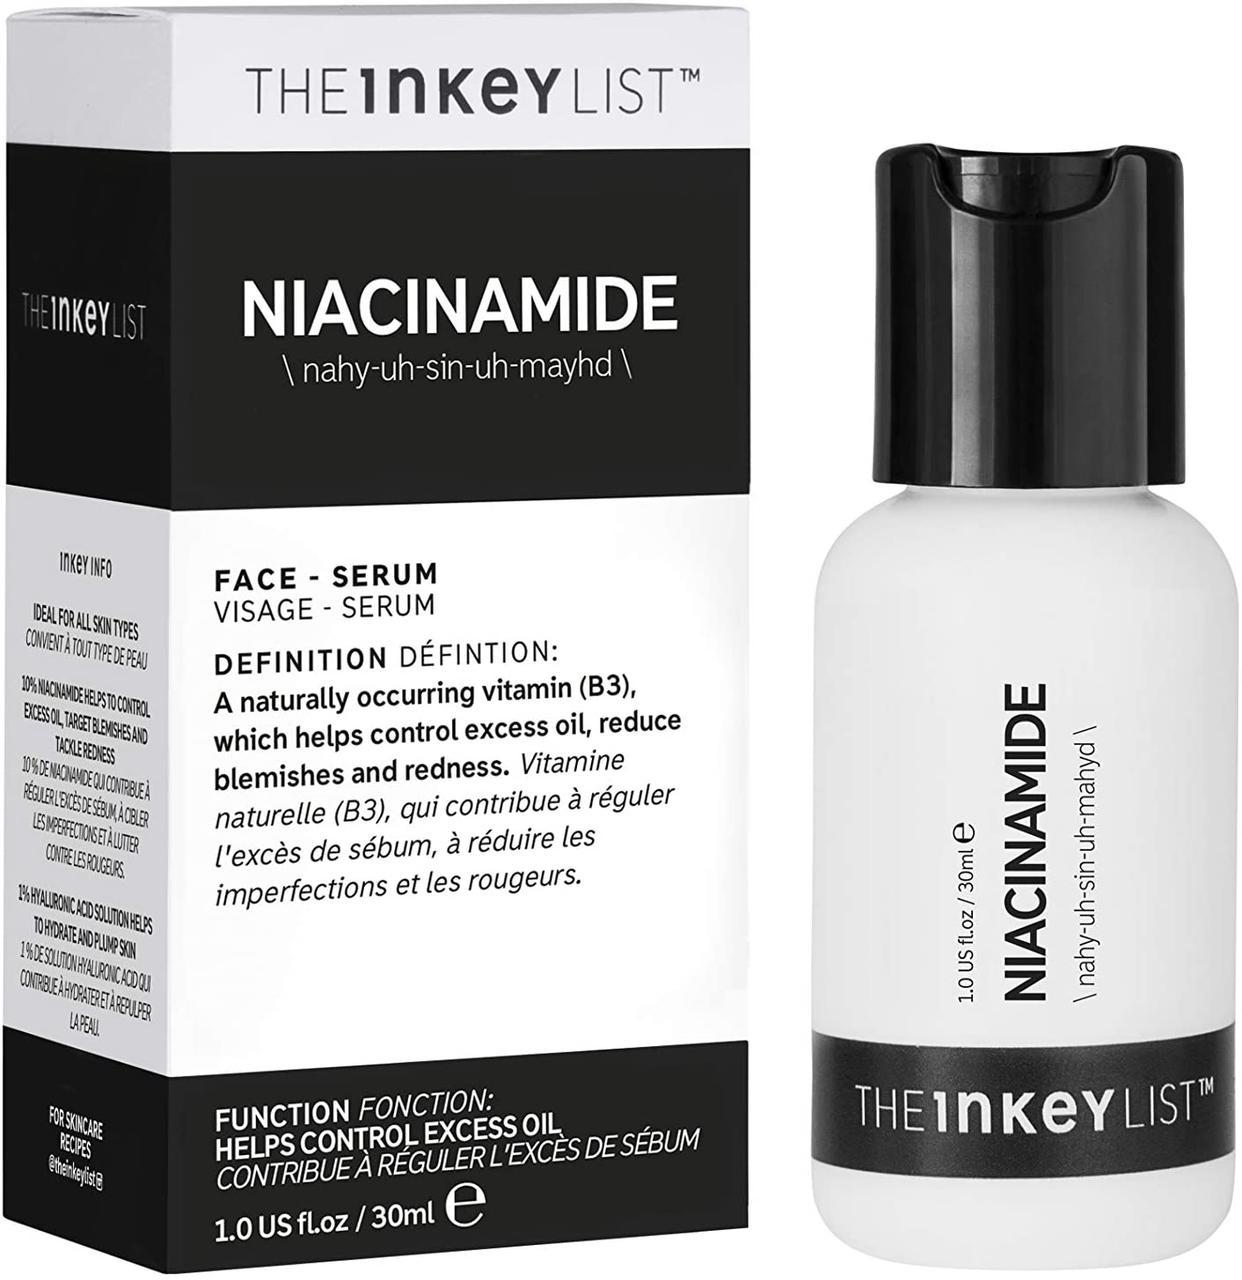 Сыворотка с ниацинамидом THE INKEY LIST  Niacinamide  30 мл